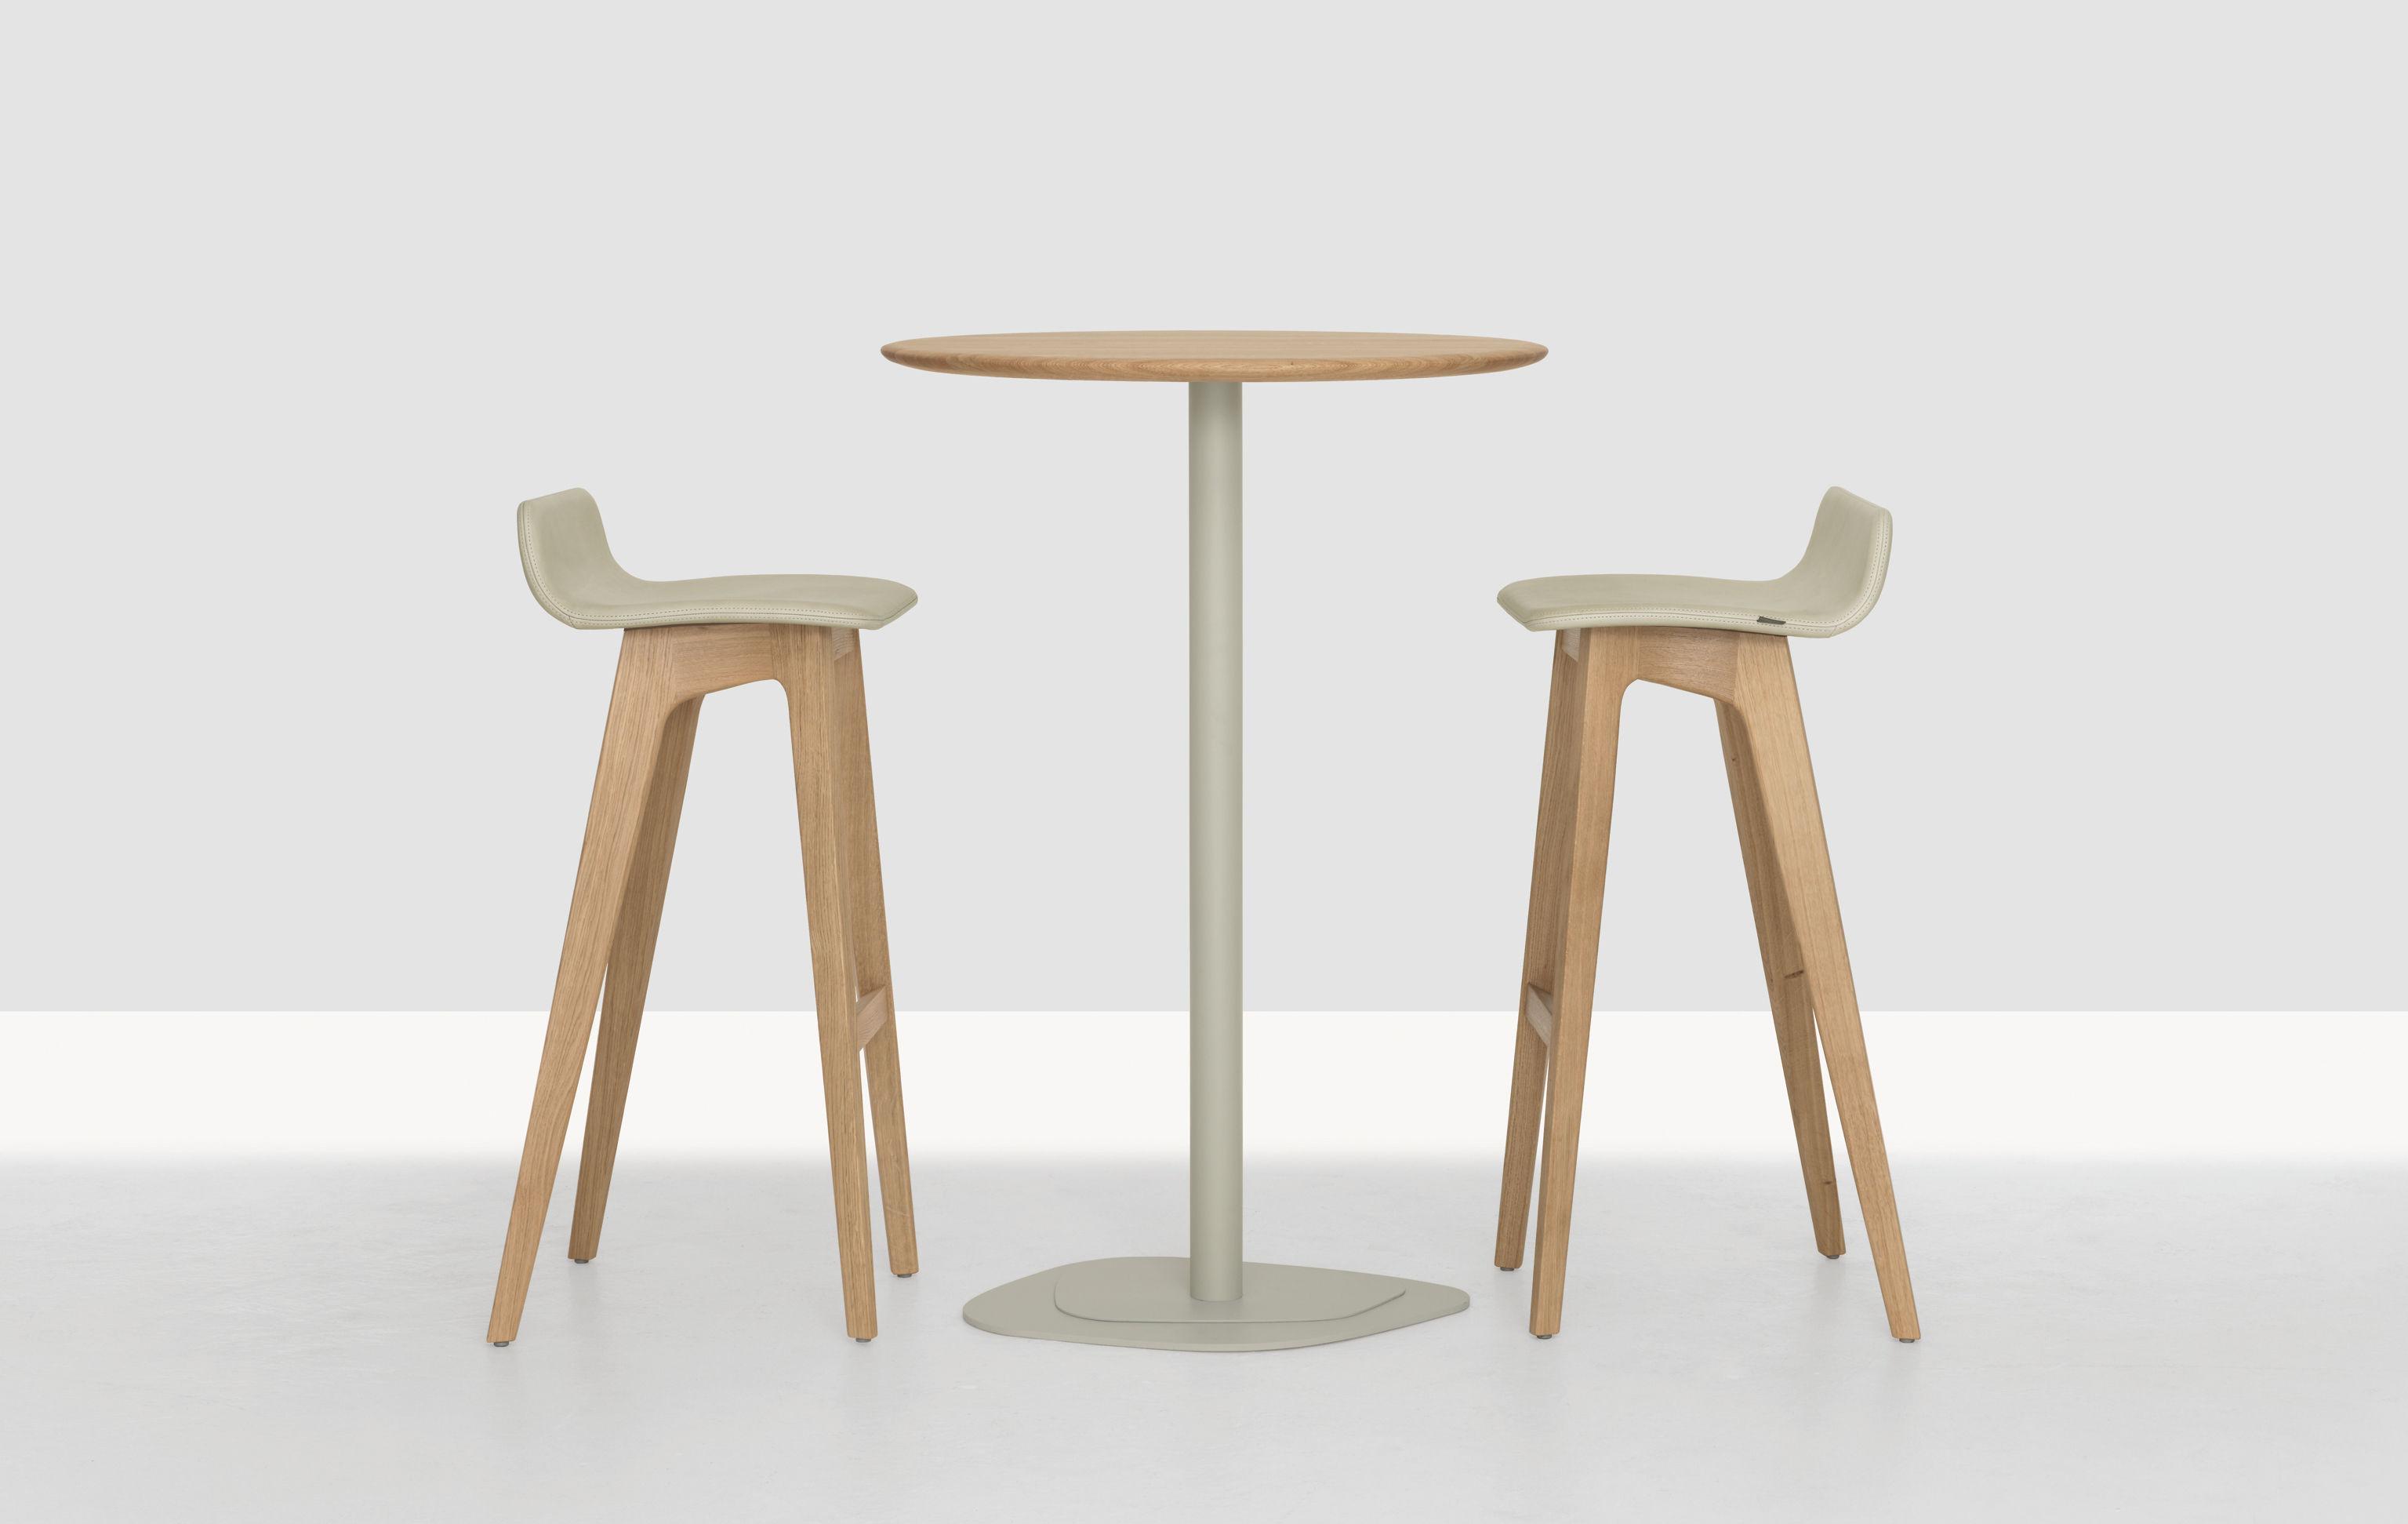 tabouret de bar morph zeitraum structure ch ne naturel rev tement cuir beige couture. Black Bedroom Furniture Sets. Home Design Ideas